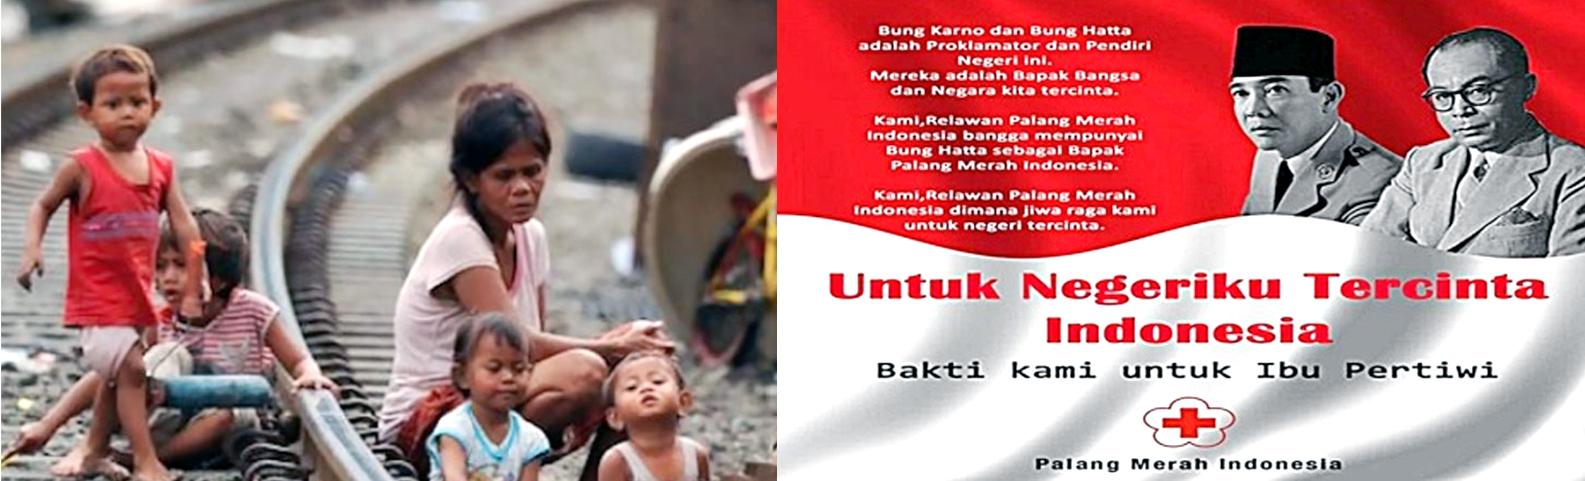 HARI PMI (Palang Merah Indonesia). Ilustrasi/Istimewa/NusantaraNews.co